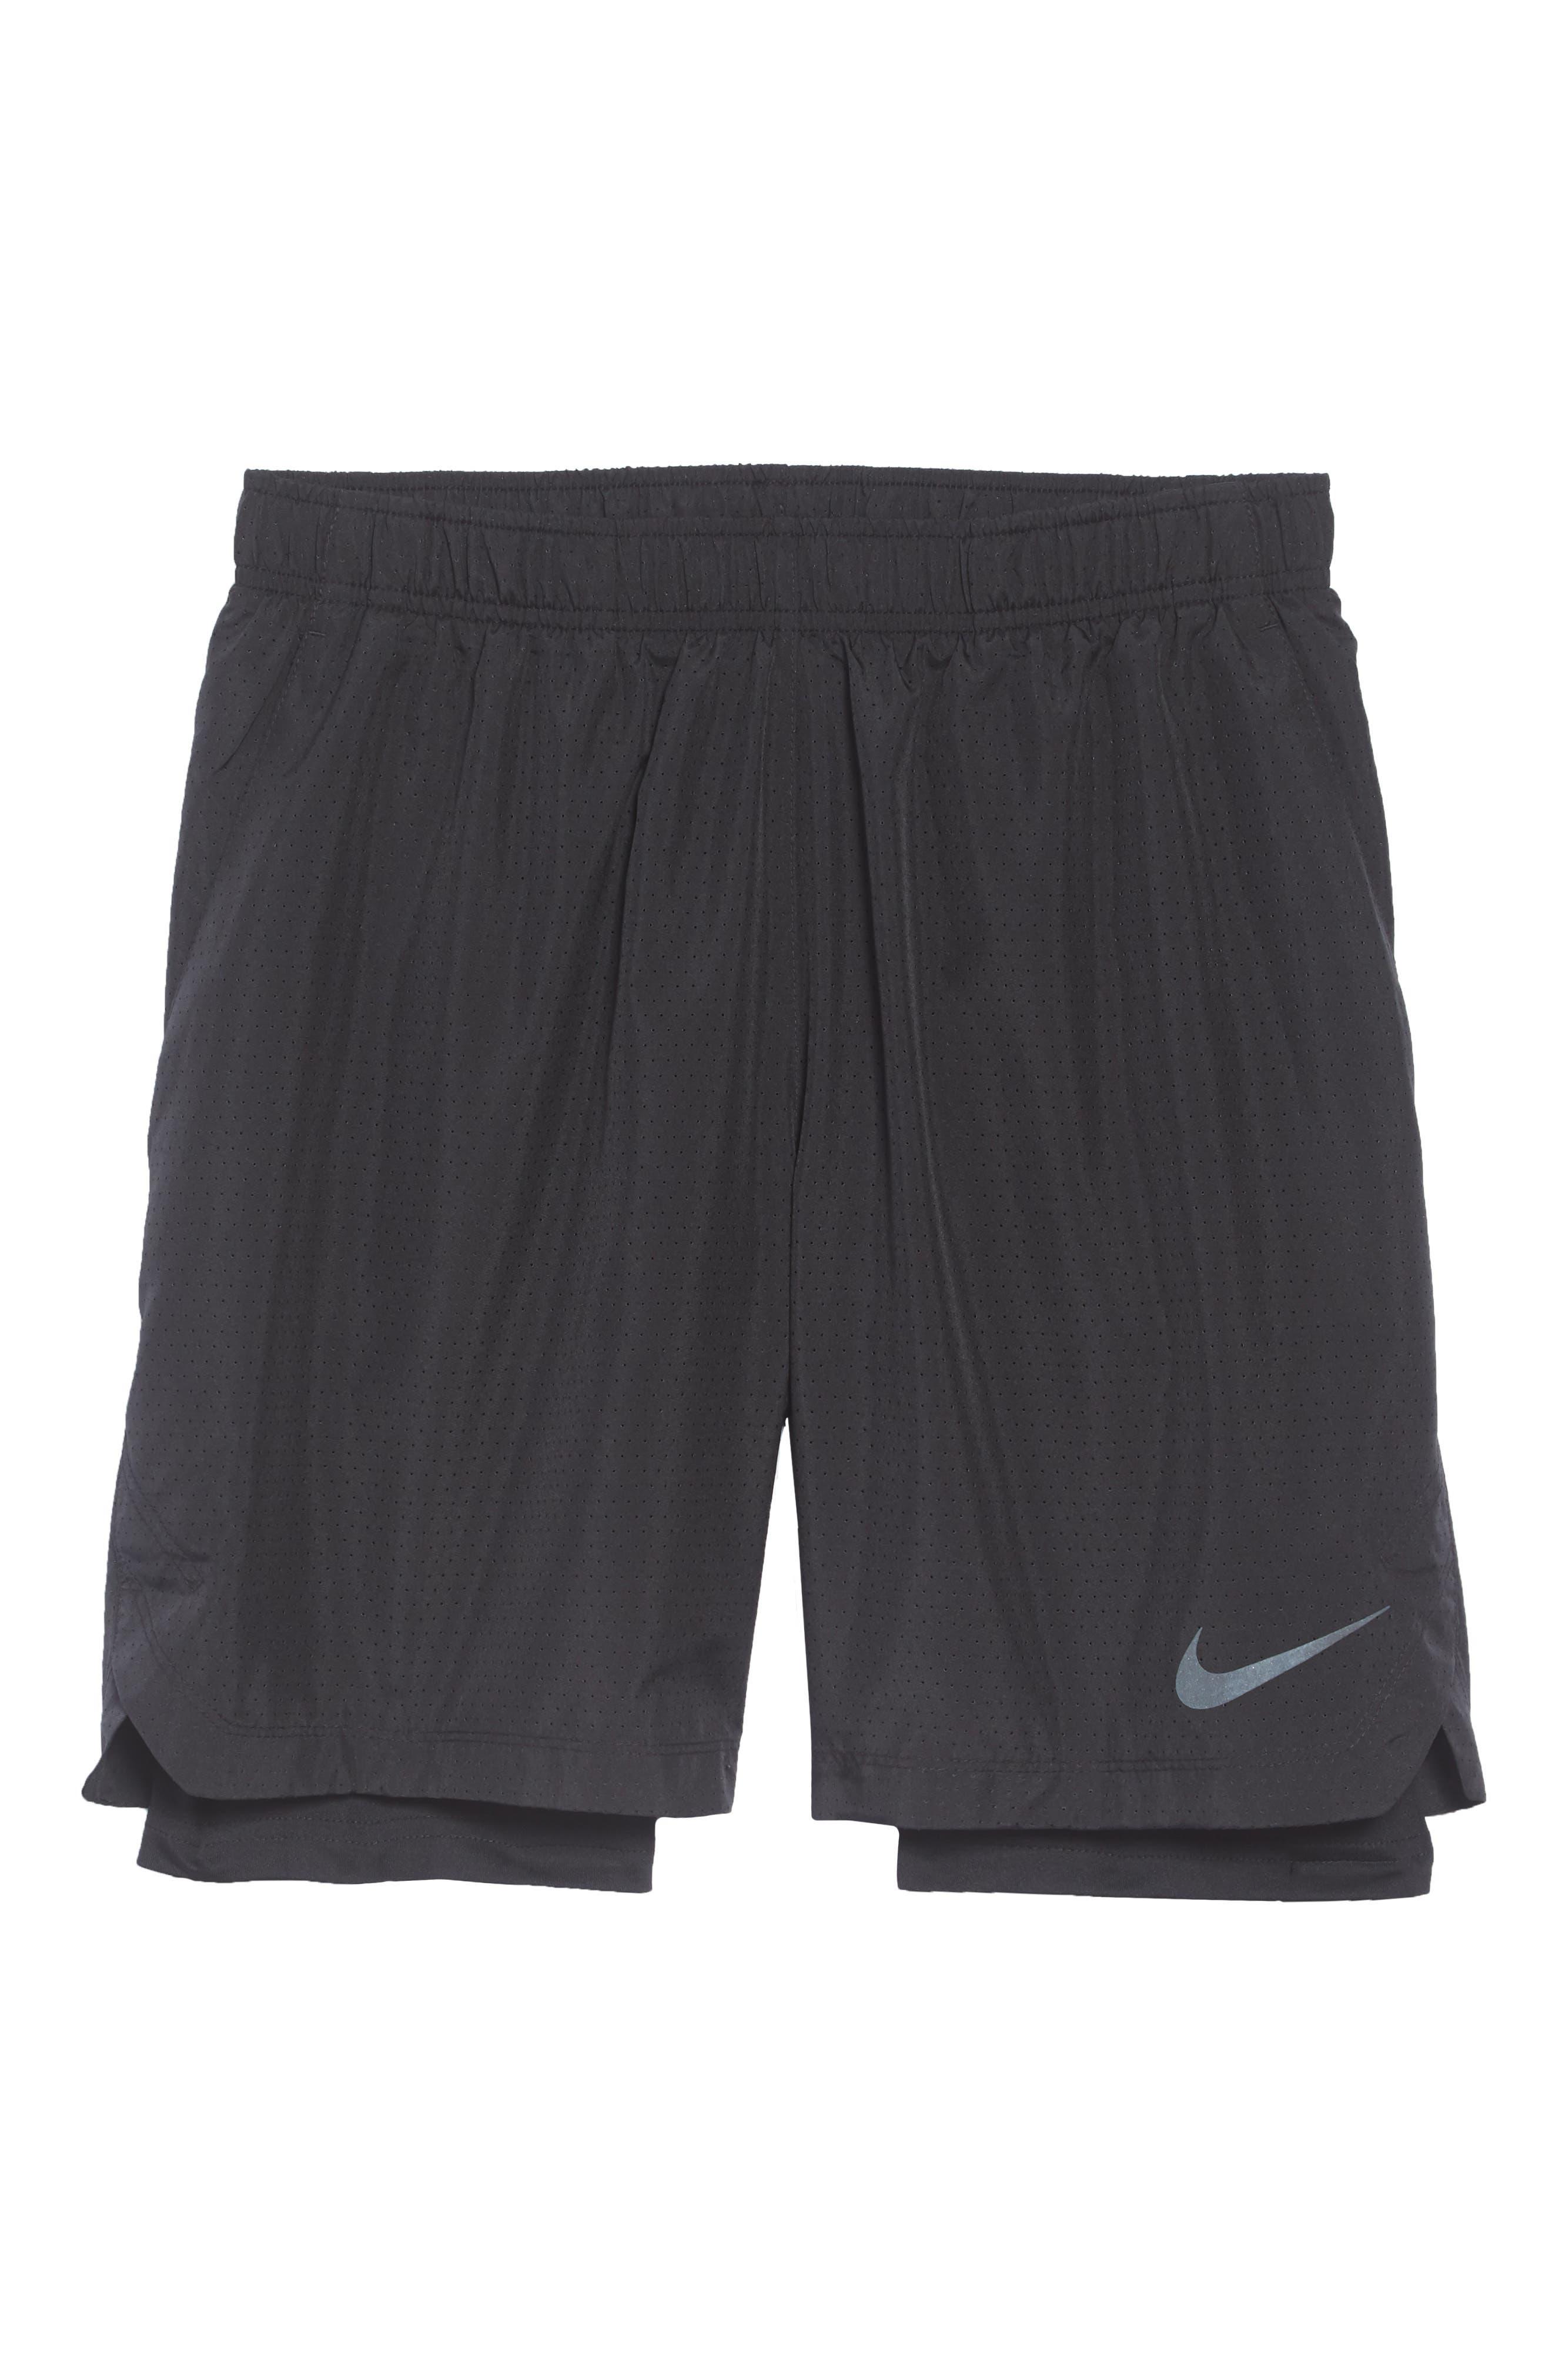 Running Challenger 2-in-1 Shorts,                             Alternate thumbnail 6, color,                             BLACK/ BLACK